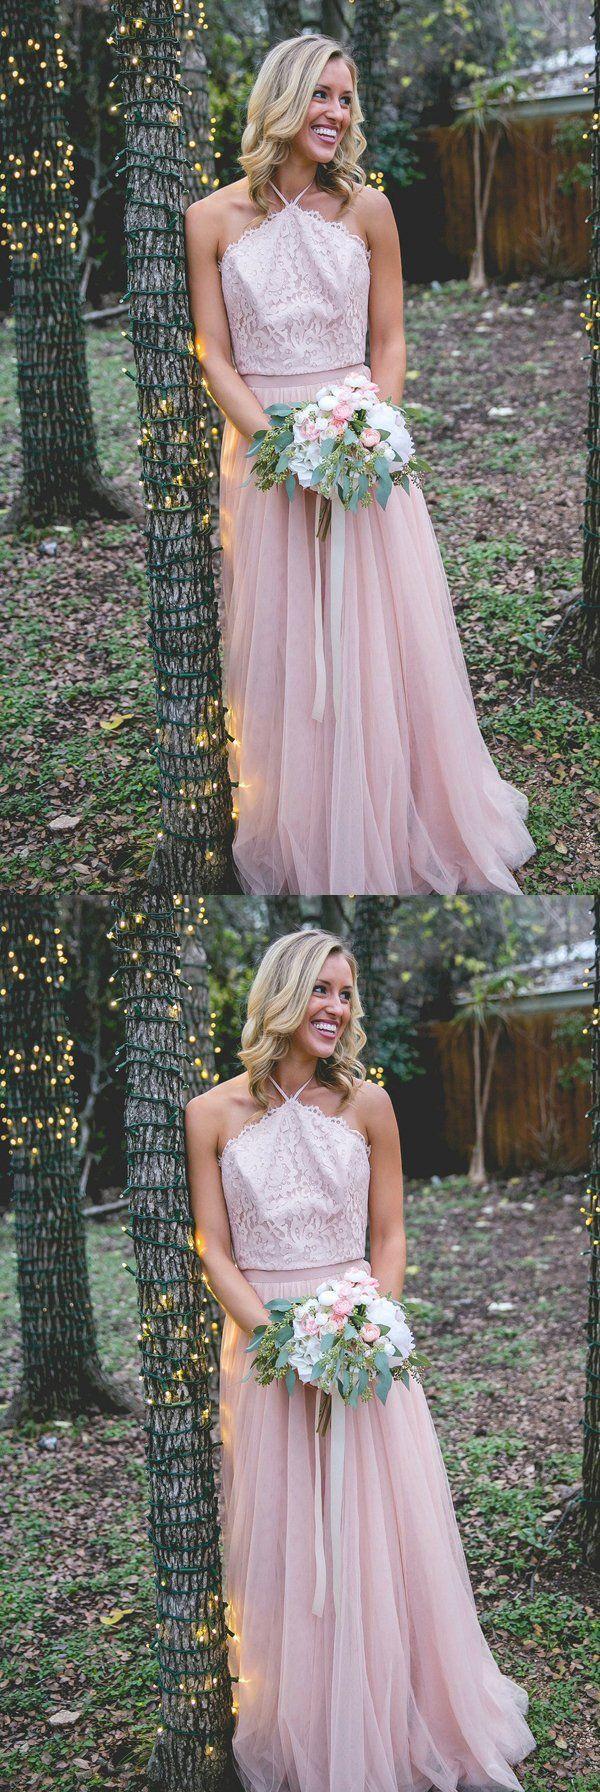 Wedding dress for evening  country lace long prom dress sleeveless aline wedding dress formal